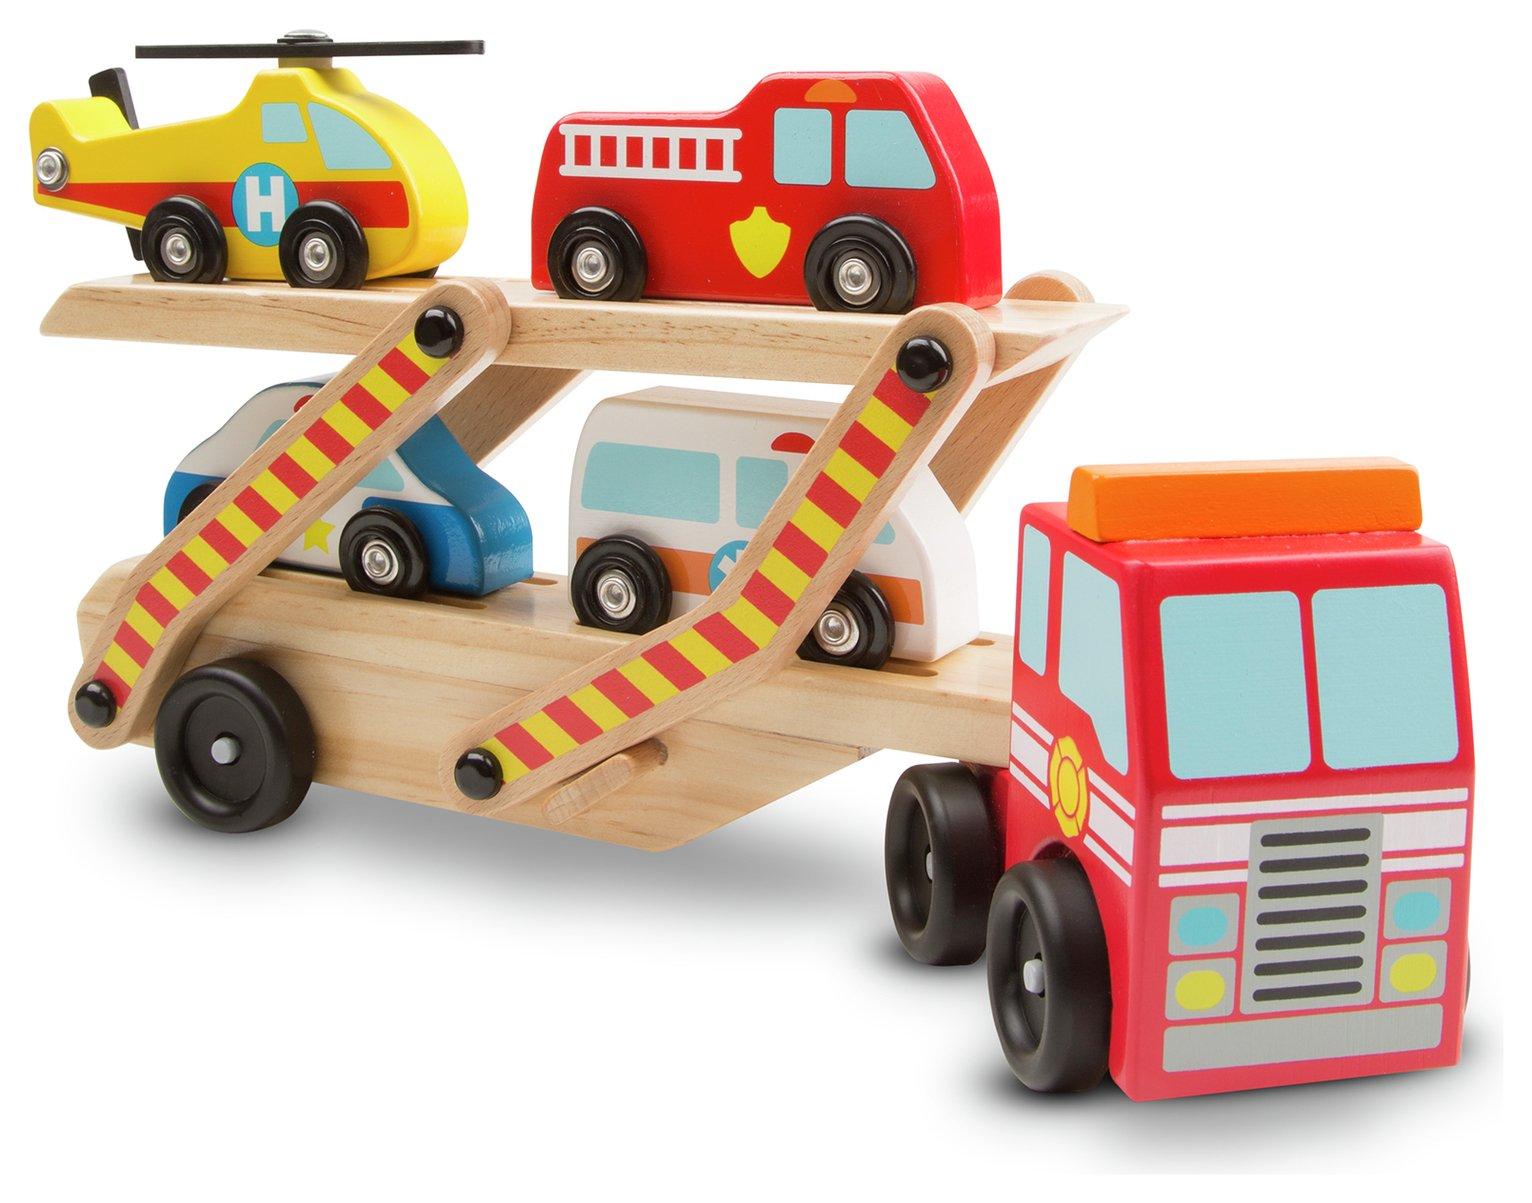 Melissa & doug Wooden Emergency Vehicle Carrier